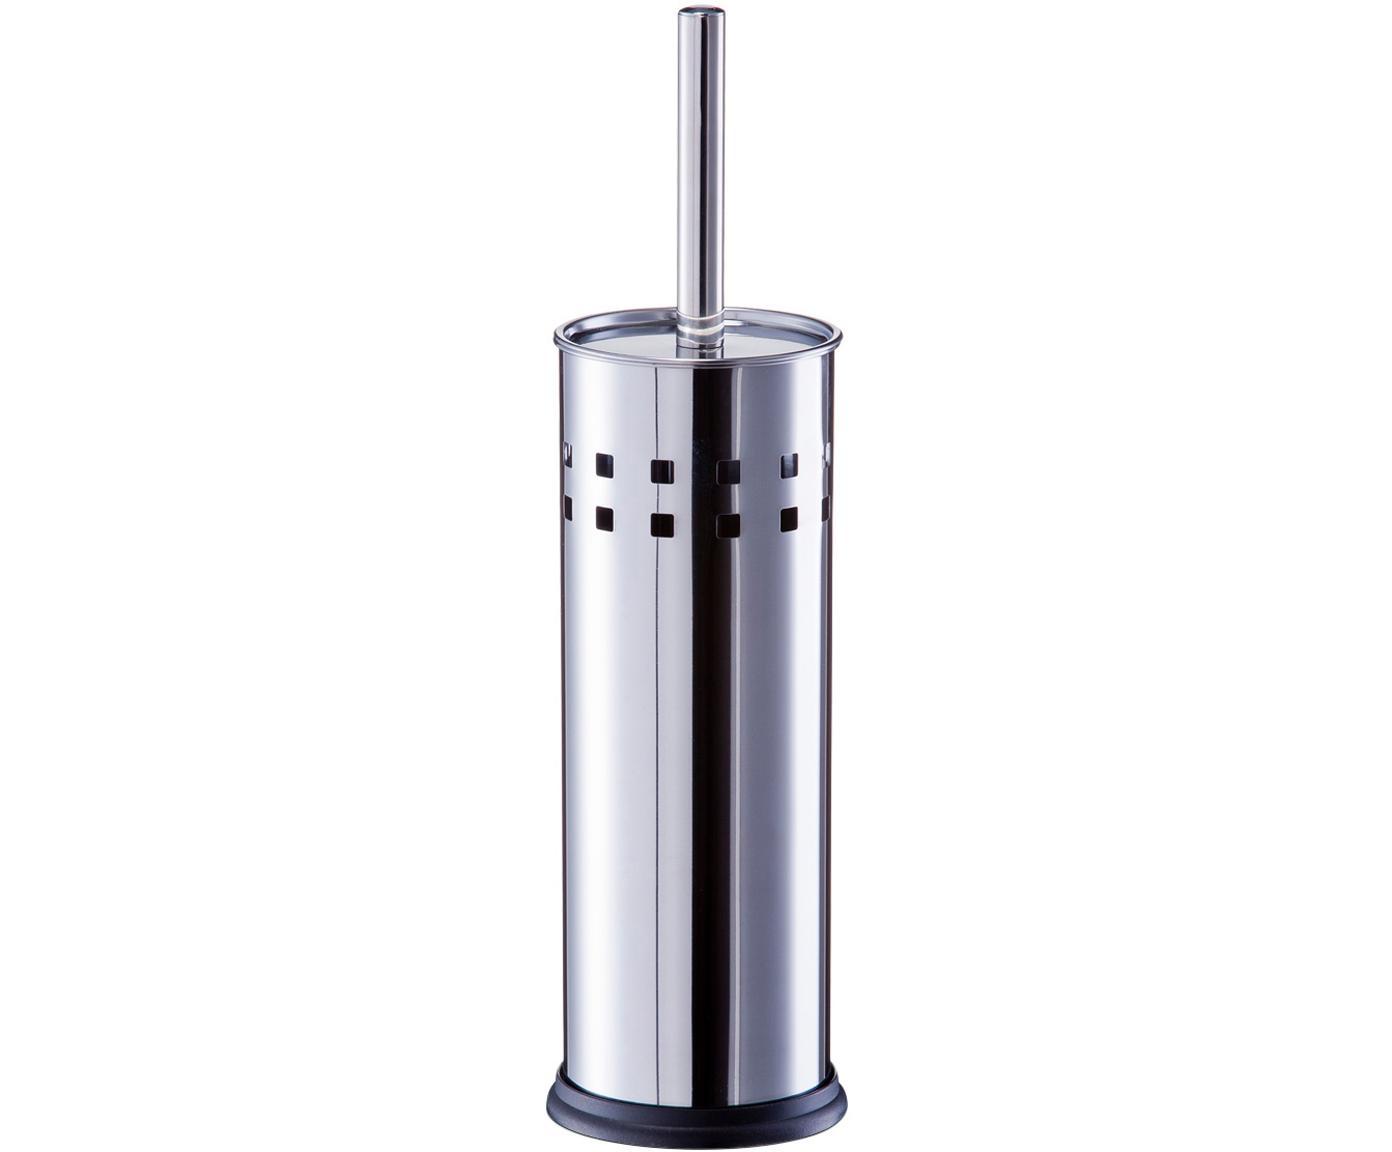 Toilettenbürste Tinni mit Edelstahl-Behälter, Edelstahl, Edelstahl, Ø 10 x H 39 cm